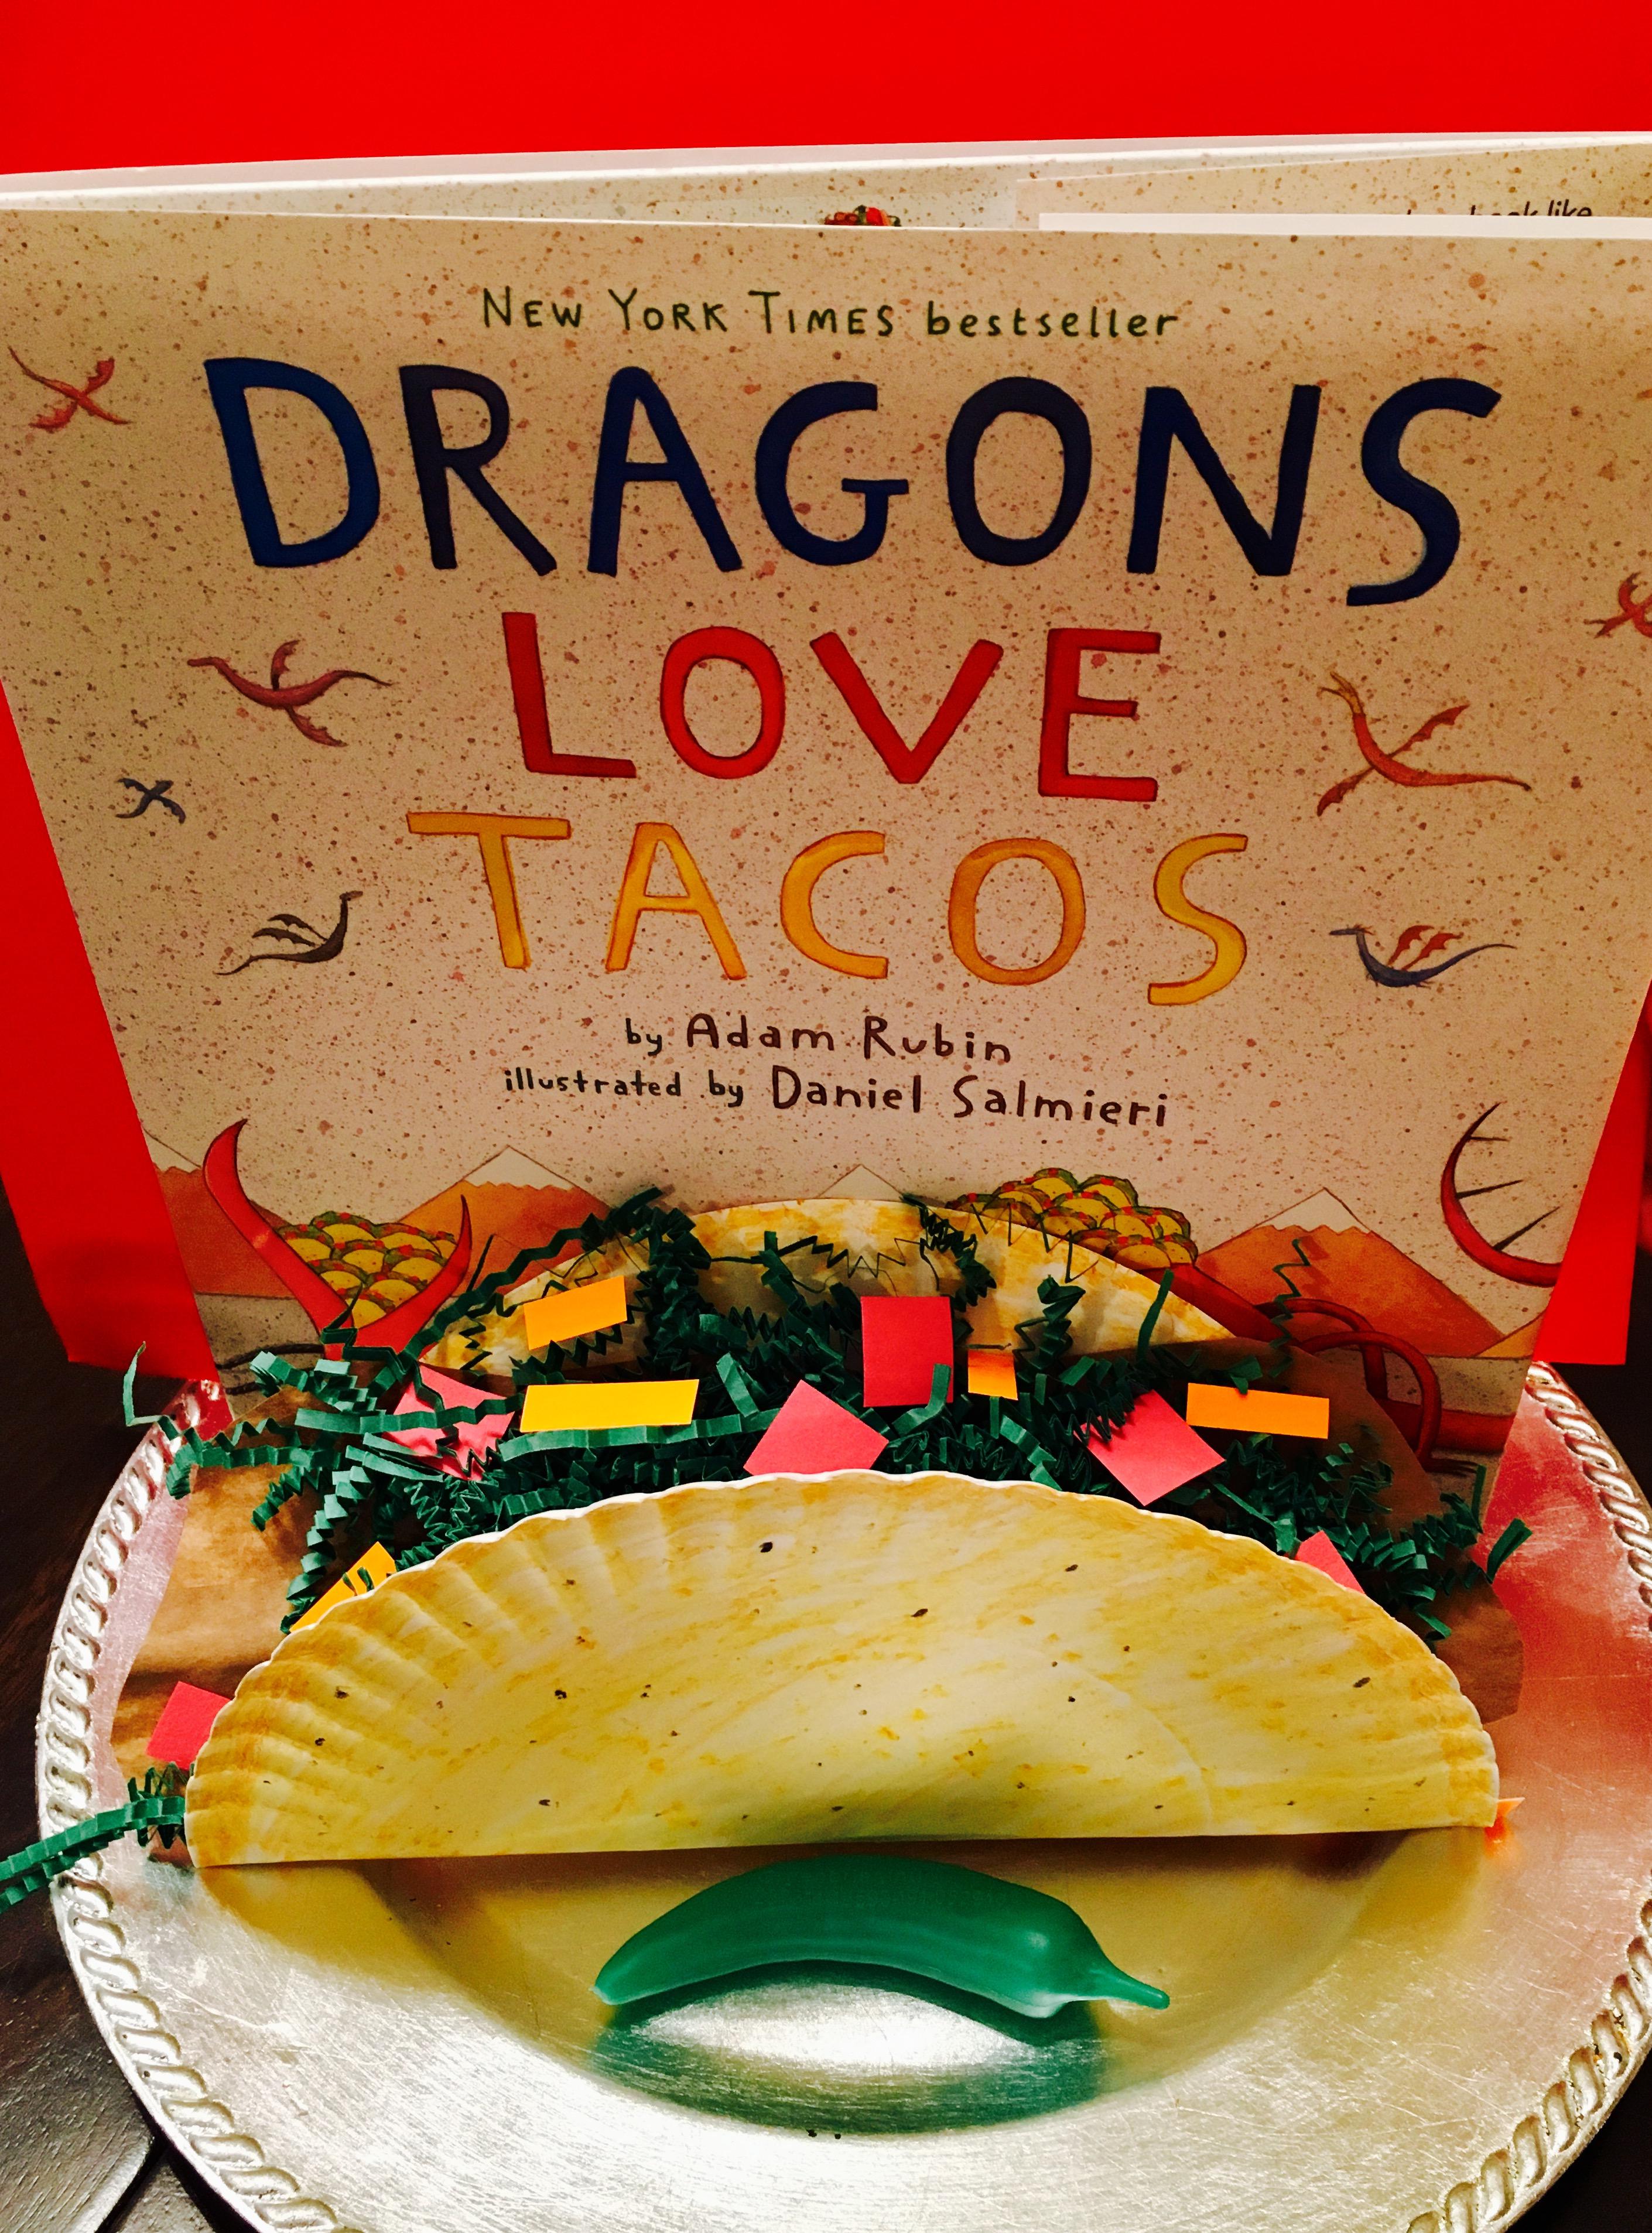 DragonsLoveTacos2